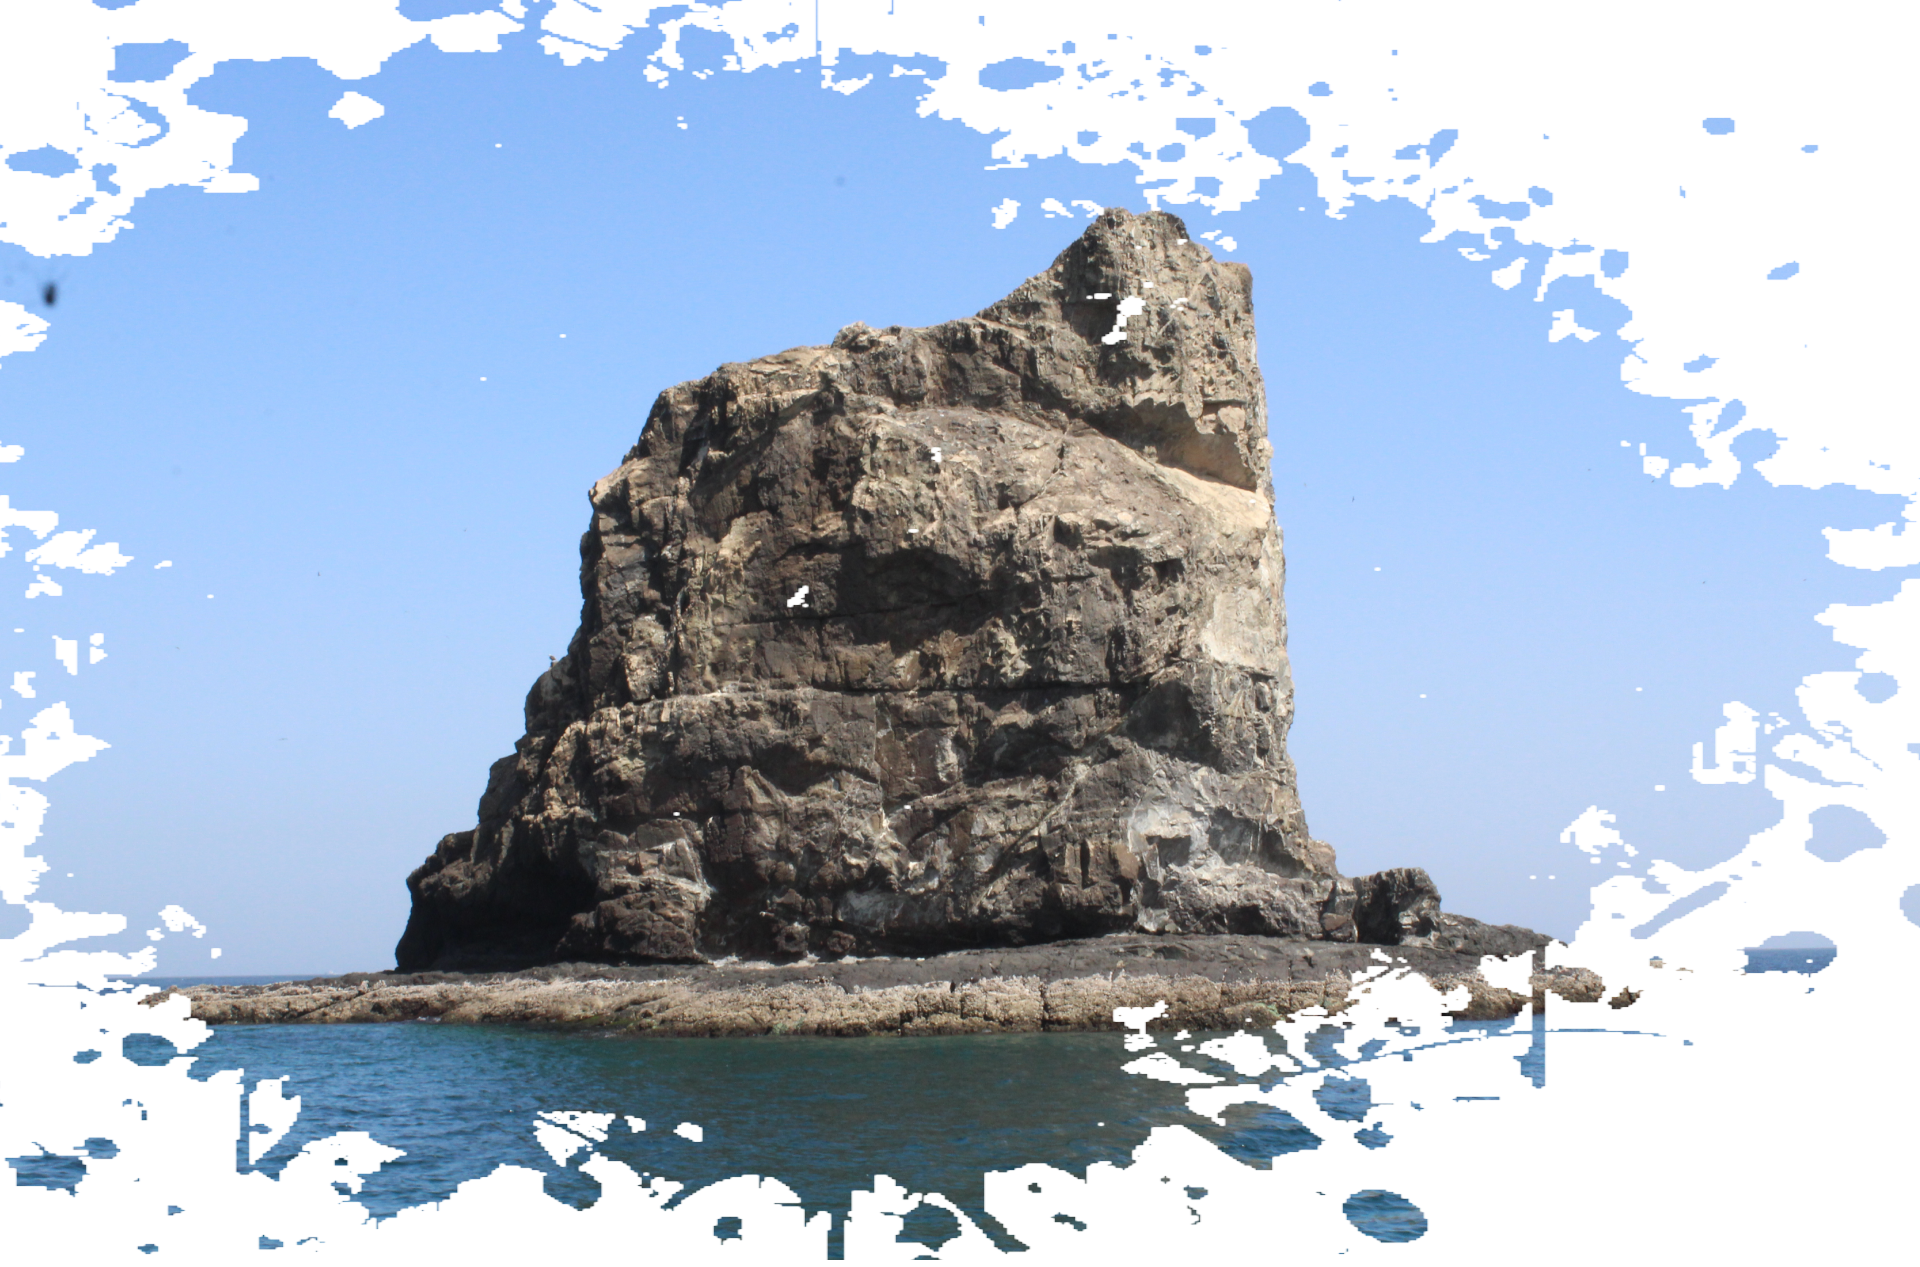 Tour Operators in Oman